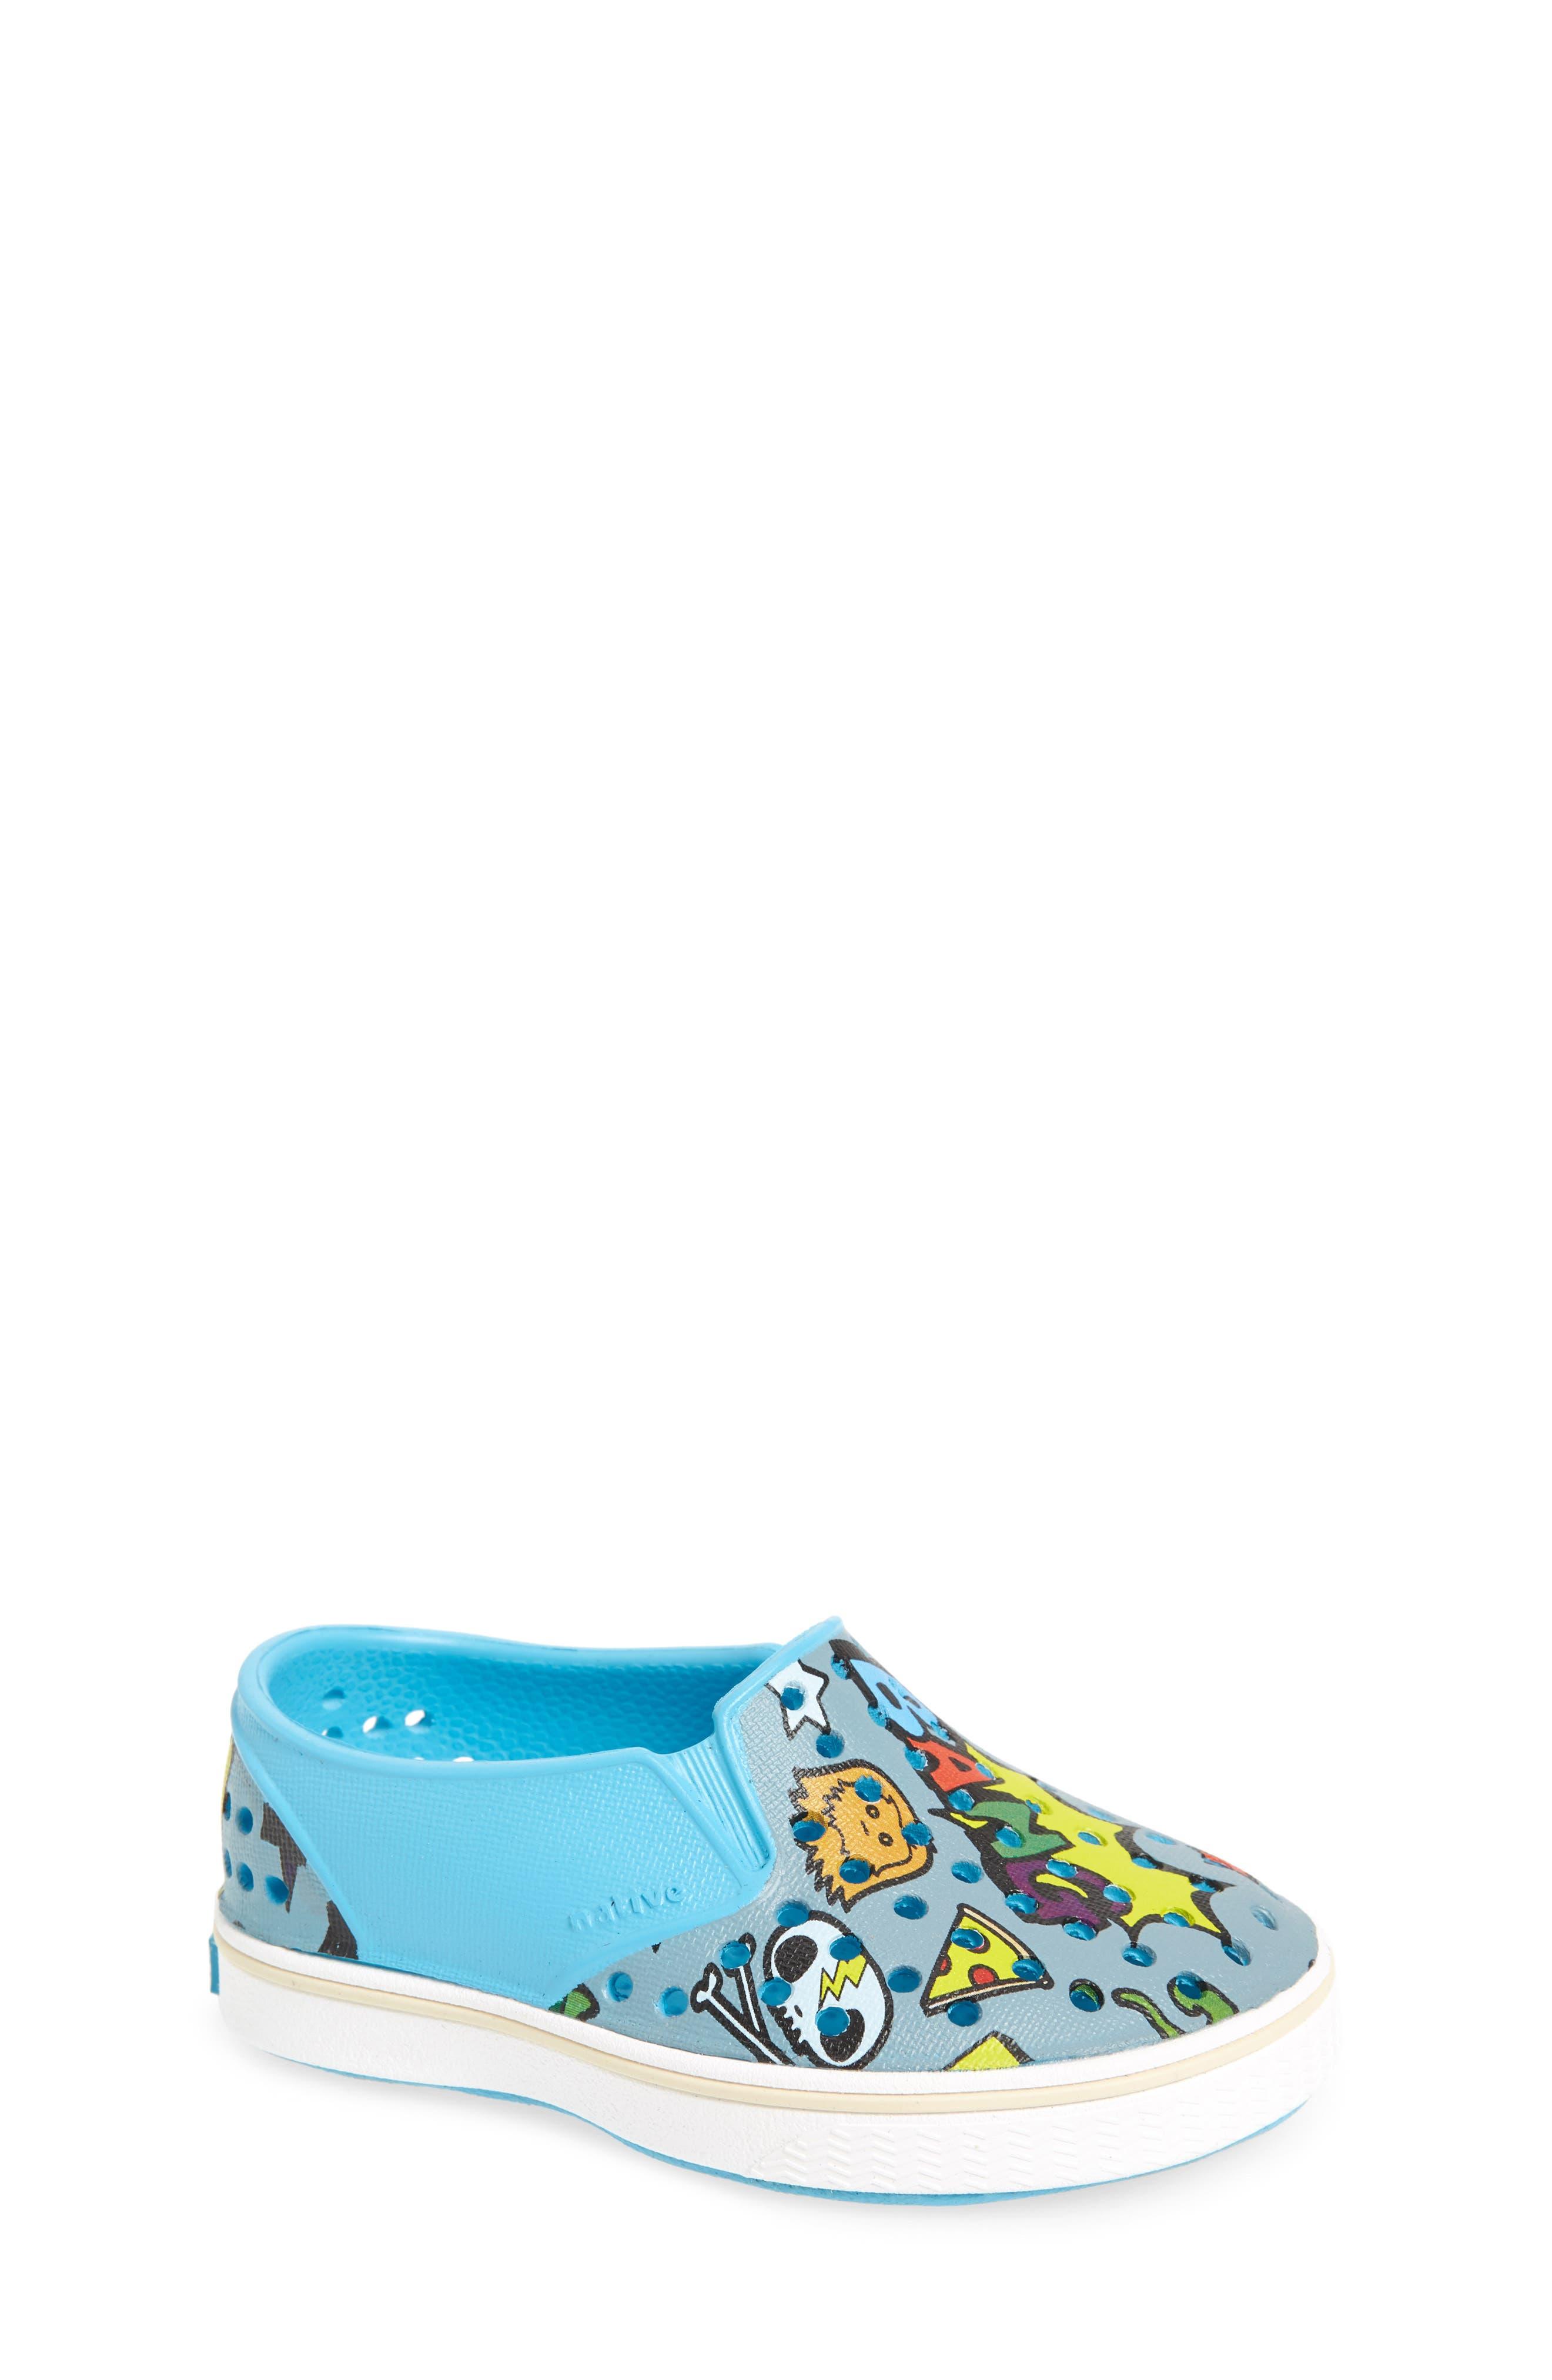 Native Shoes Miles Print Slip-On Sneaker (Baby, Walker, Toddler, Little Kid & Big Kid)